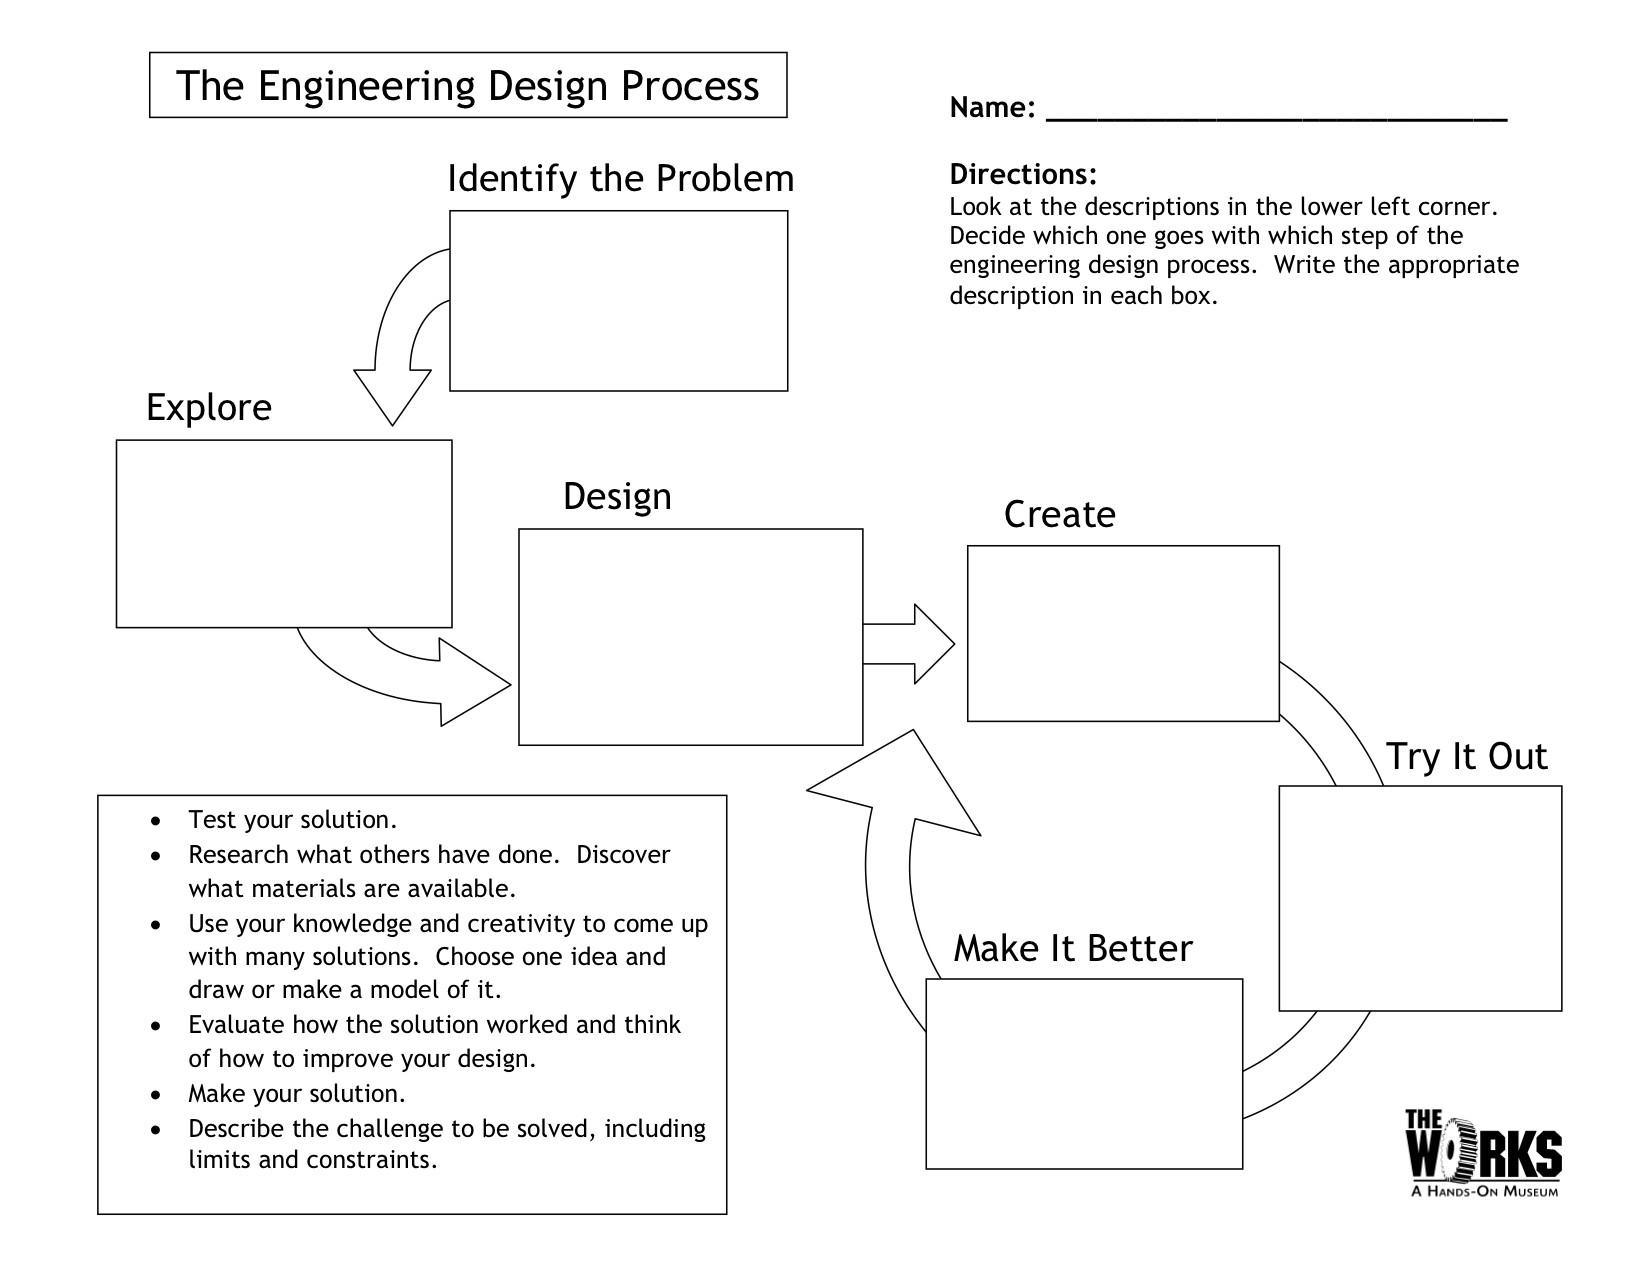 30 Engineering Design Process Worksheet Pdf | Education ...